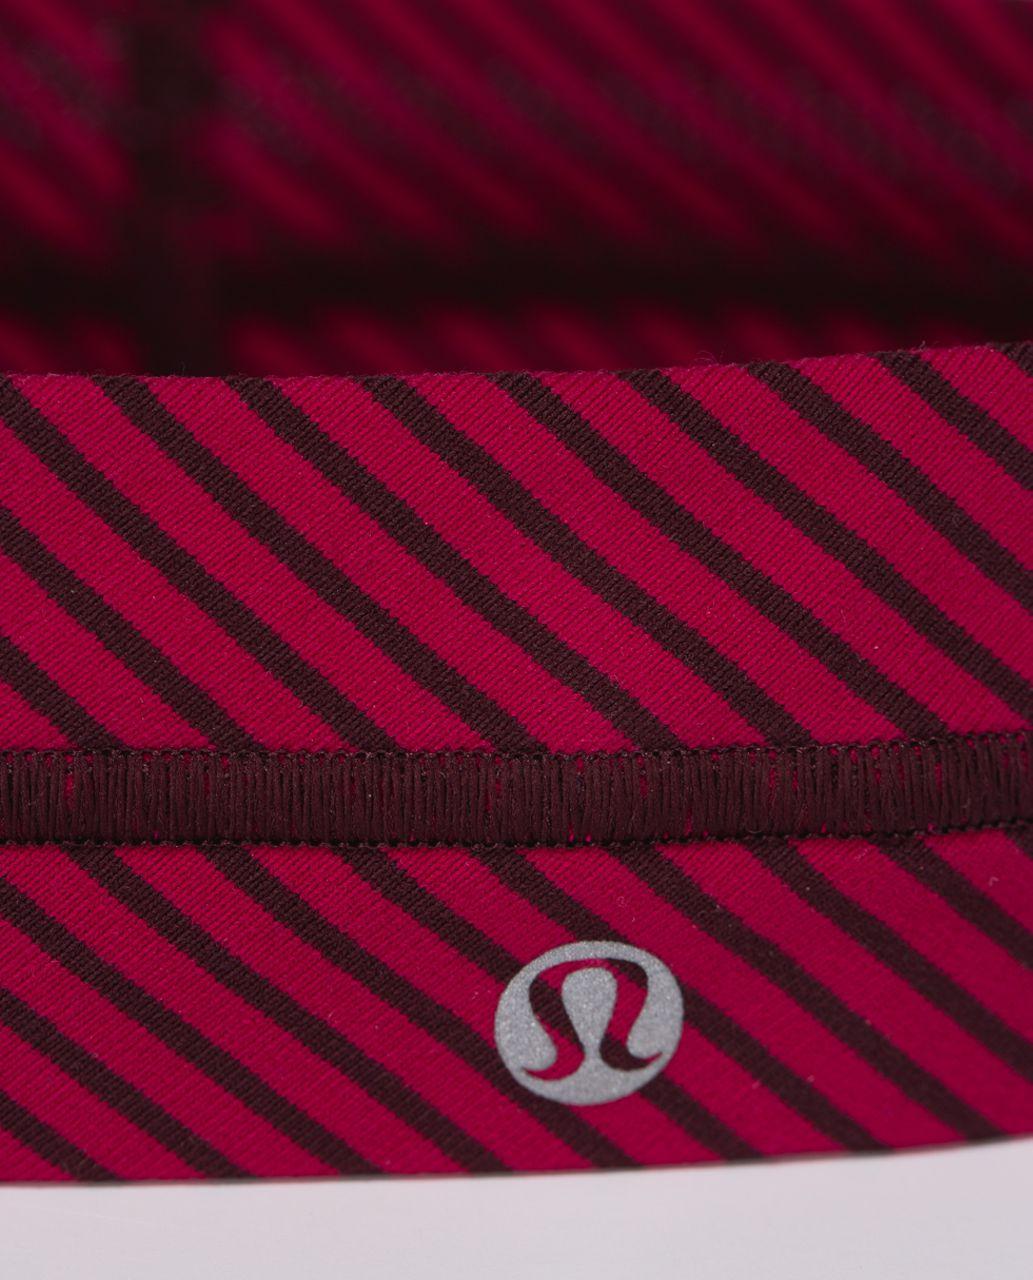 Lululemon Fly Away Tamer Headband - Hyper Stripe Bordeaux Drama Bumble Berry